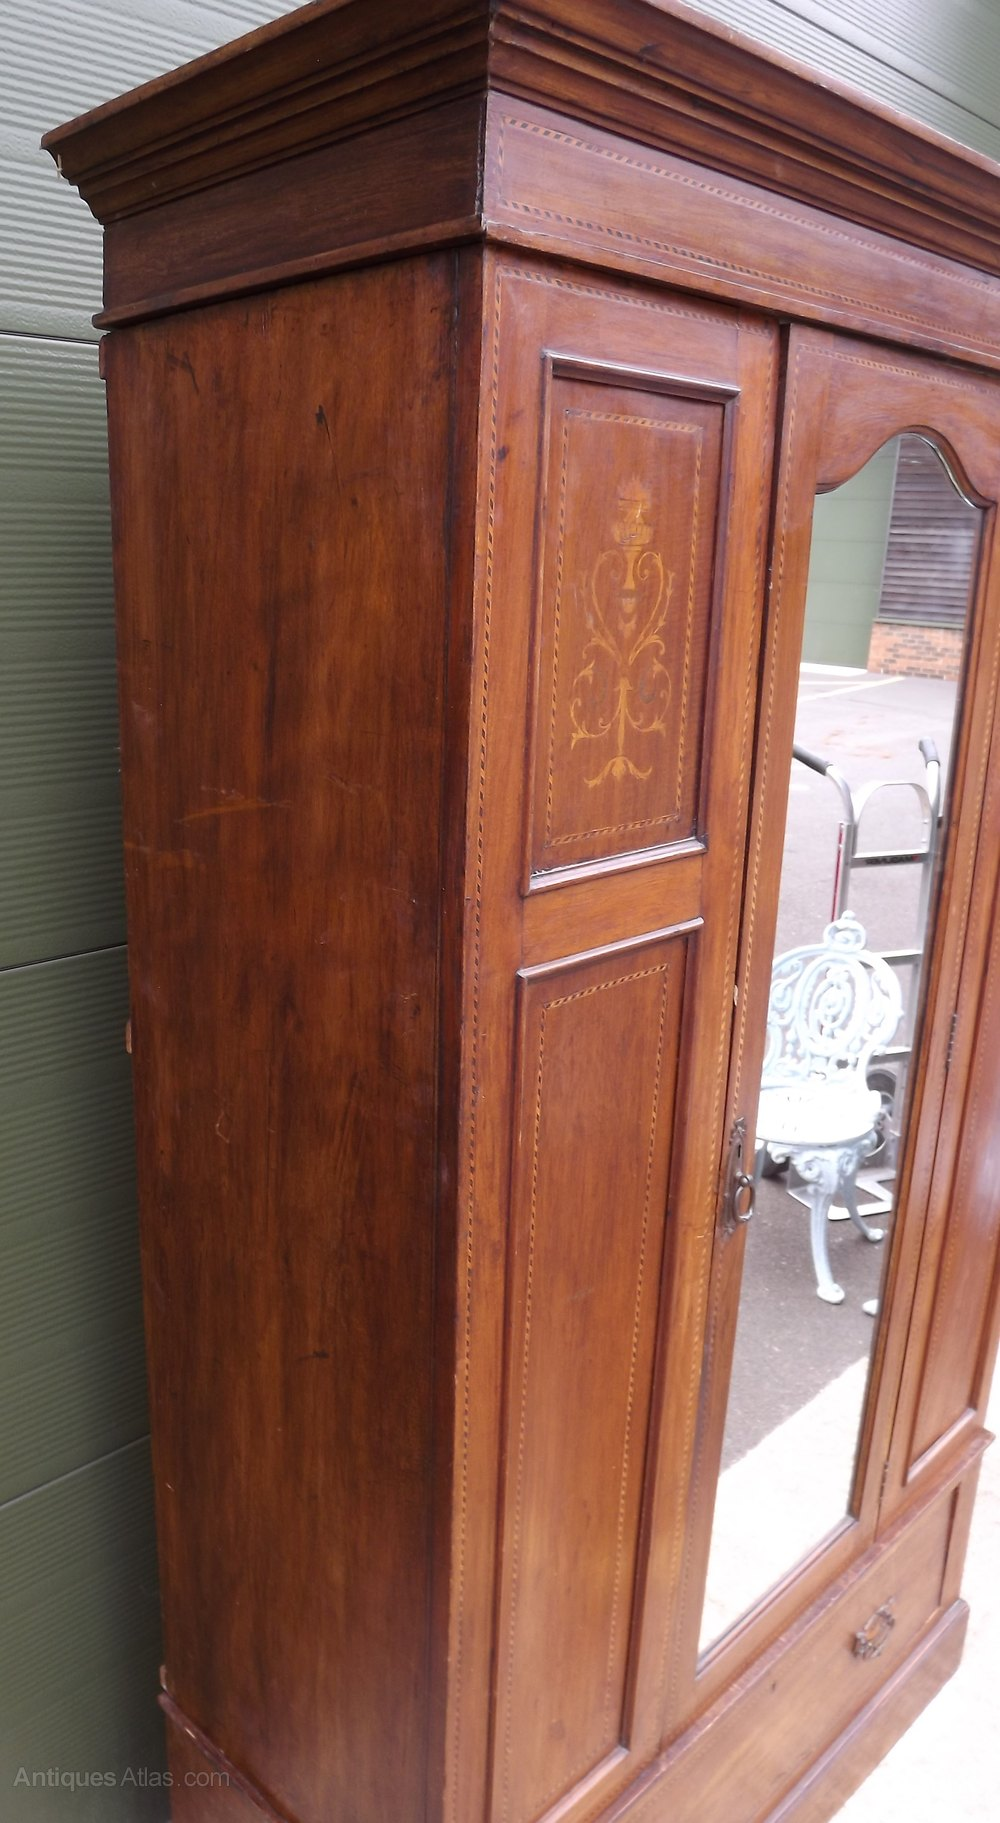 Edwardian Inlaid Mahogany Mirrored Door Wardrobe